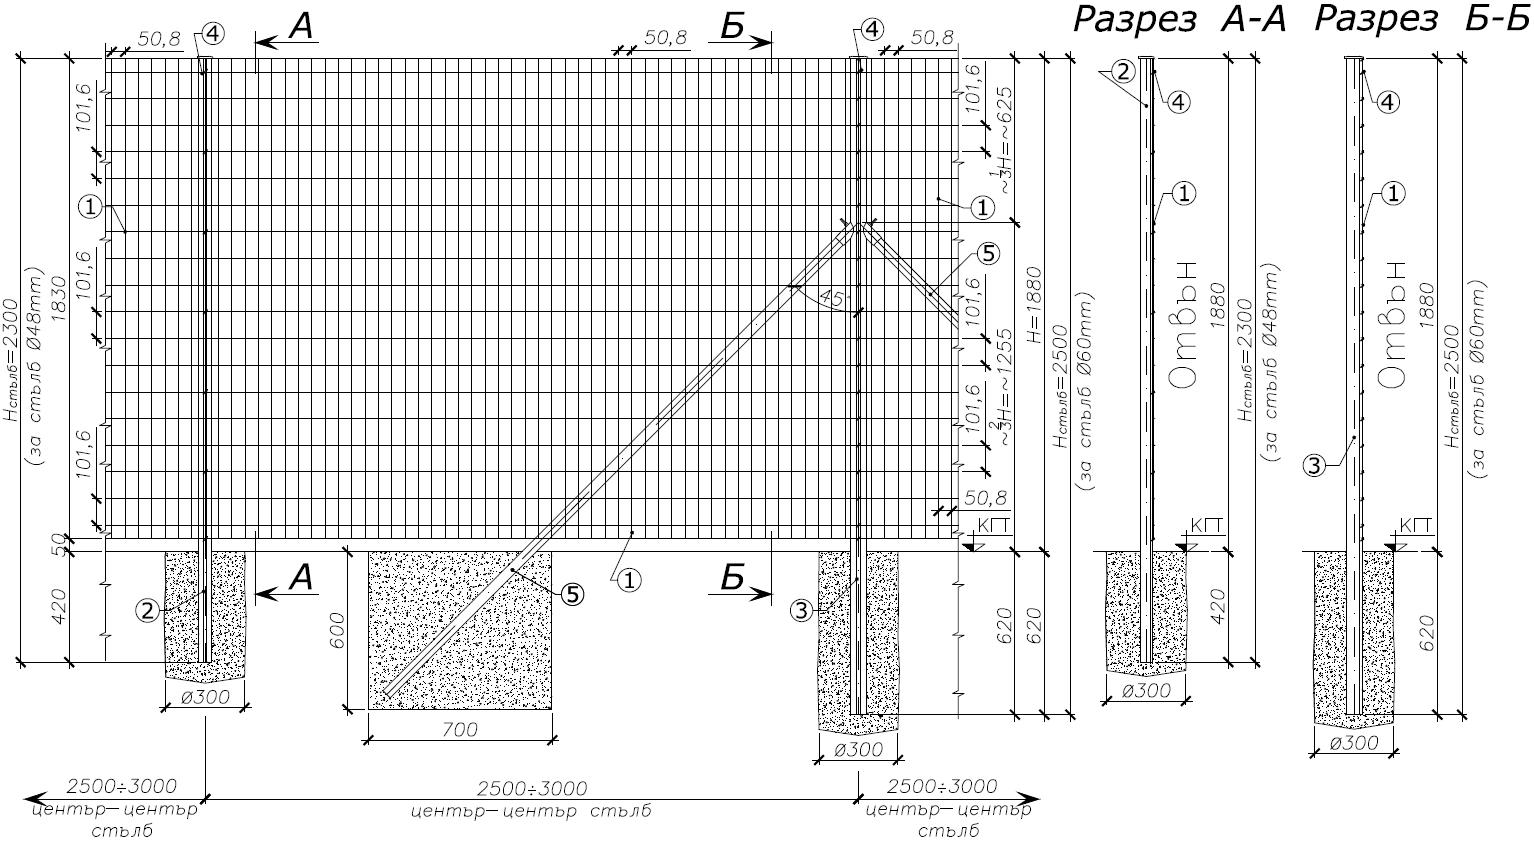 Оградни мрежи PANTANET ESSENTIAL - чертеж